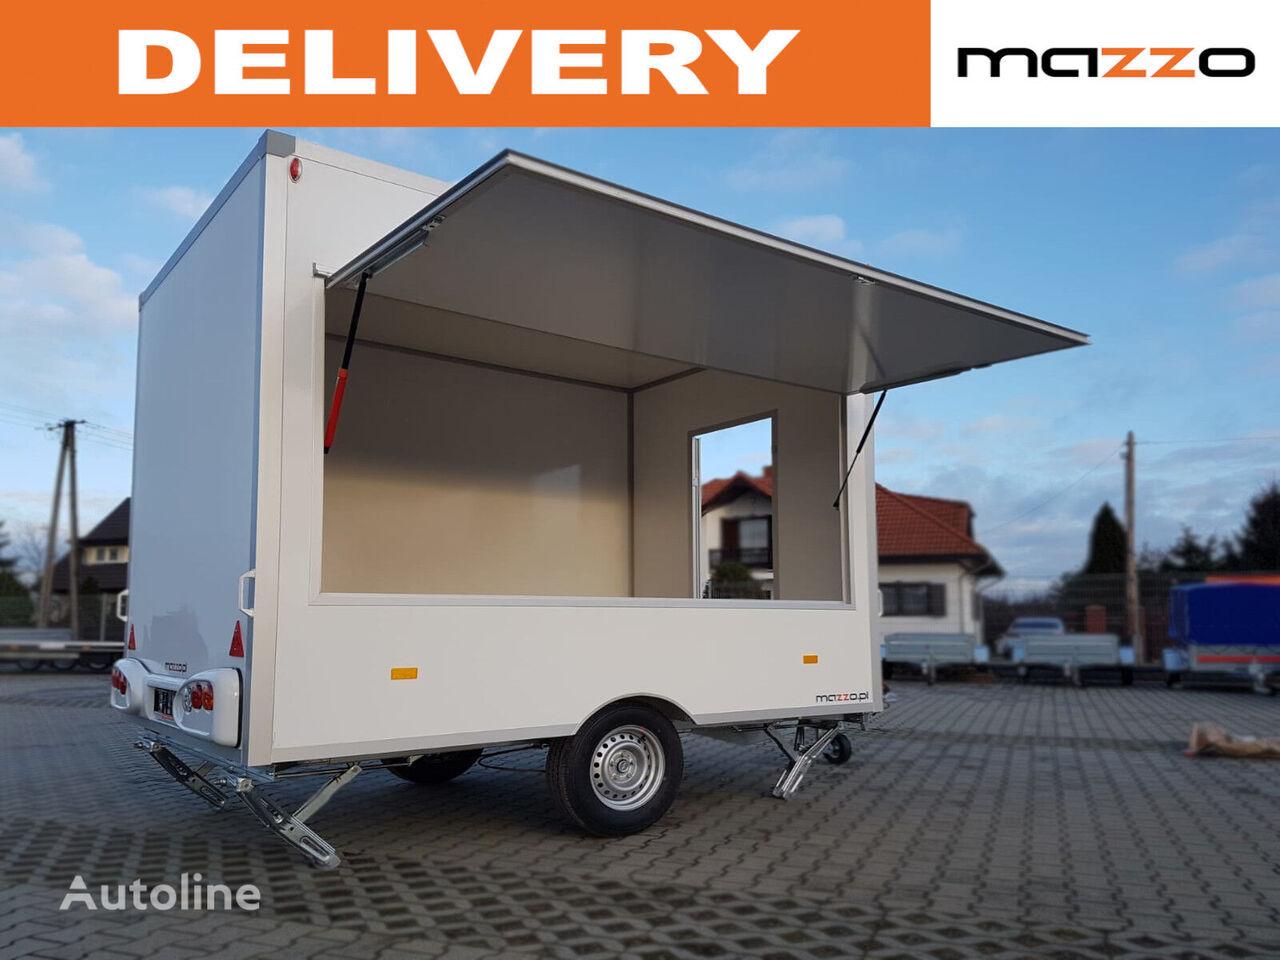 remorque magasin NIEWIADOW H13301H 3x2.03x2.3m Mobile catering trailer street Verkaufsanhän neuve